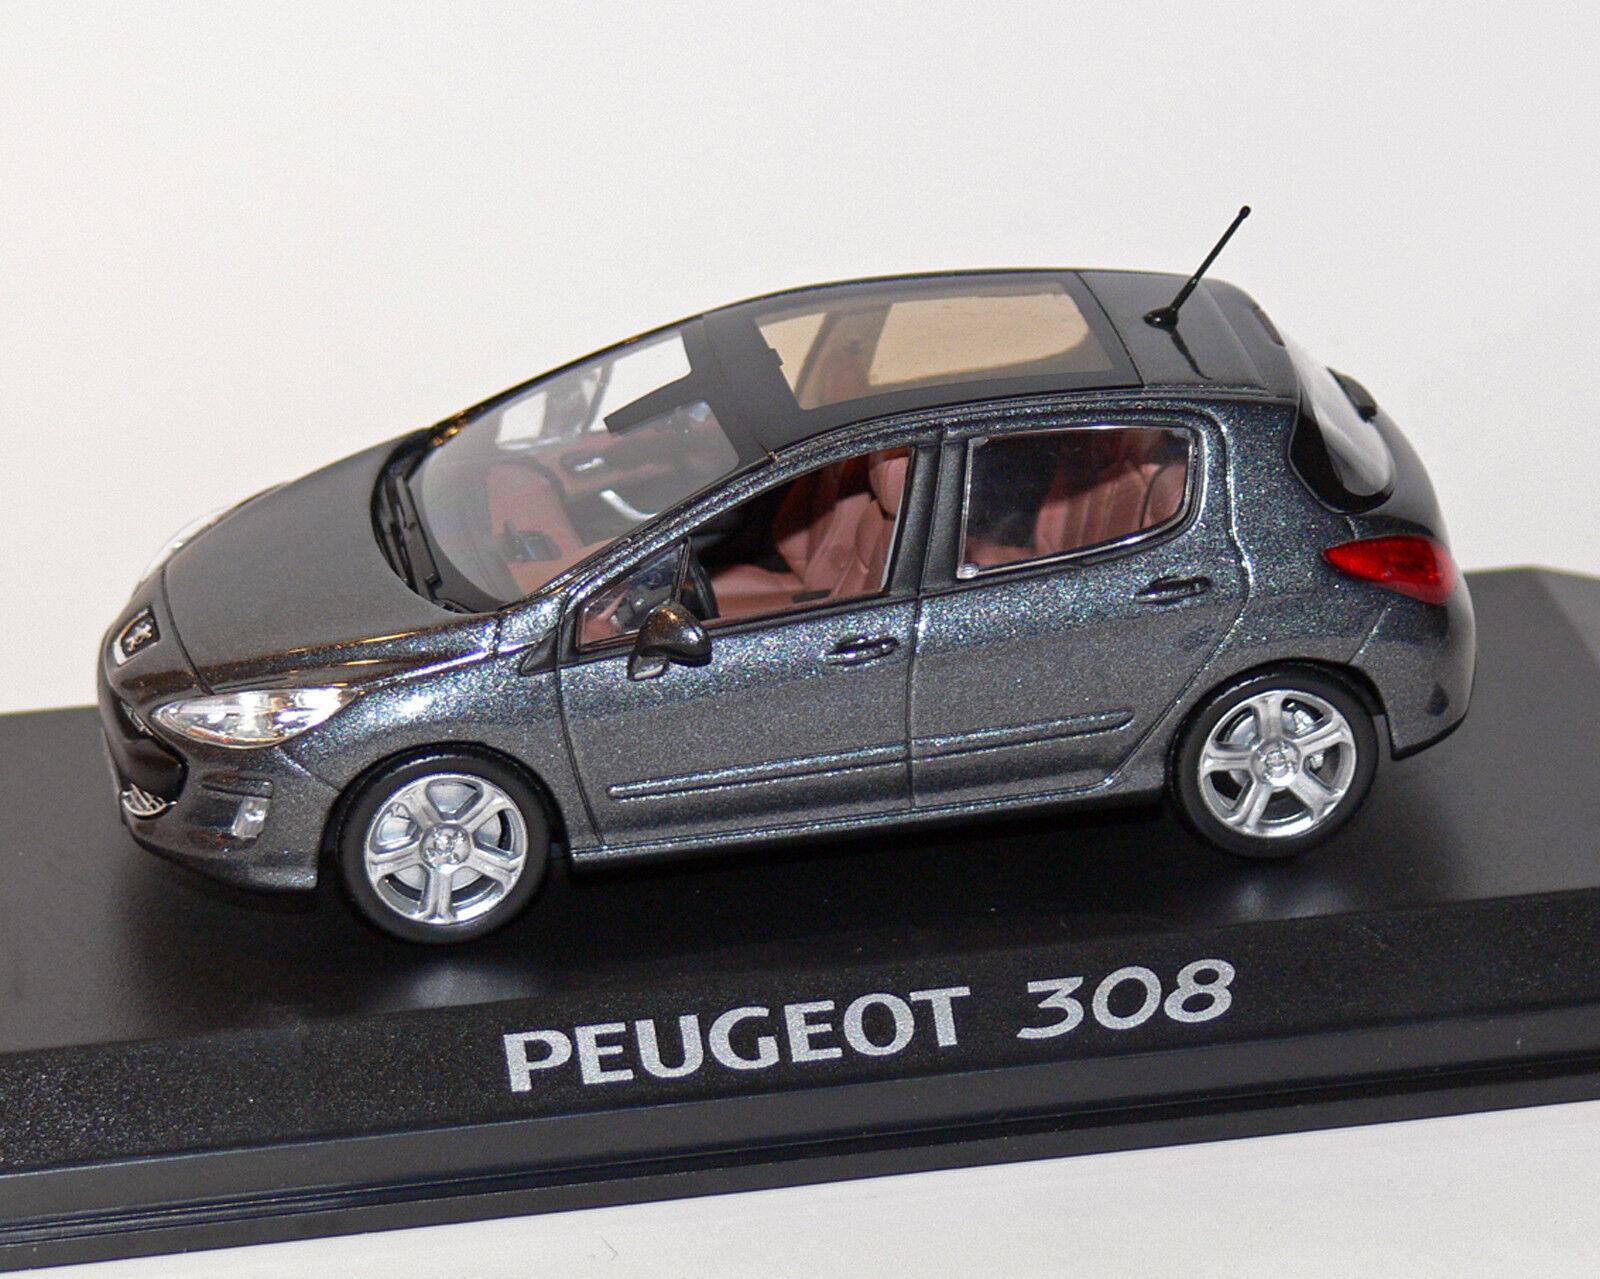 Peugeot 308 Grey Metallic, 1 43, Norev